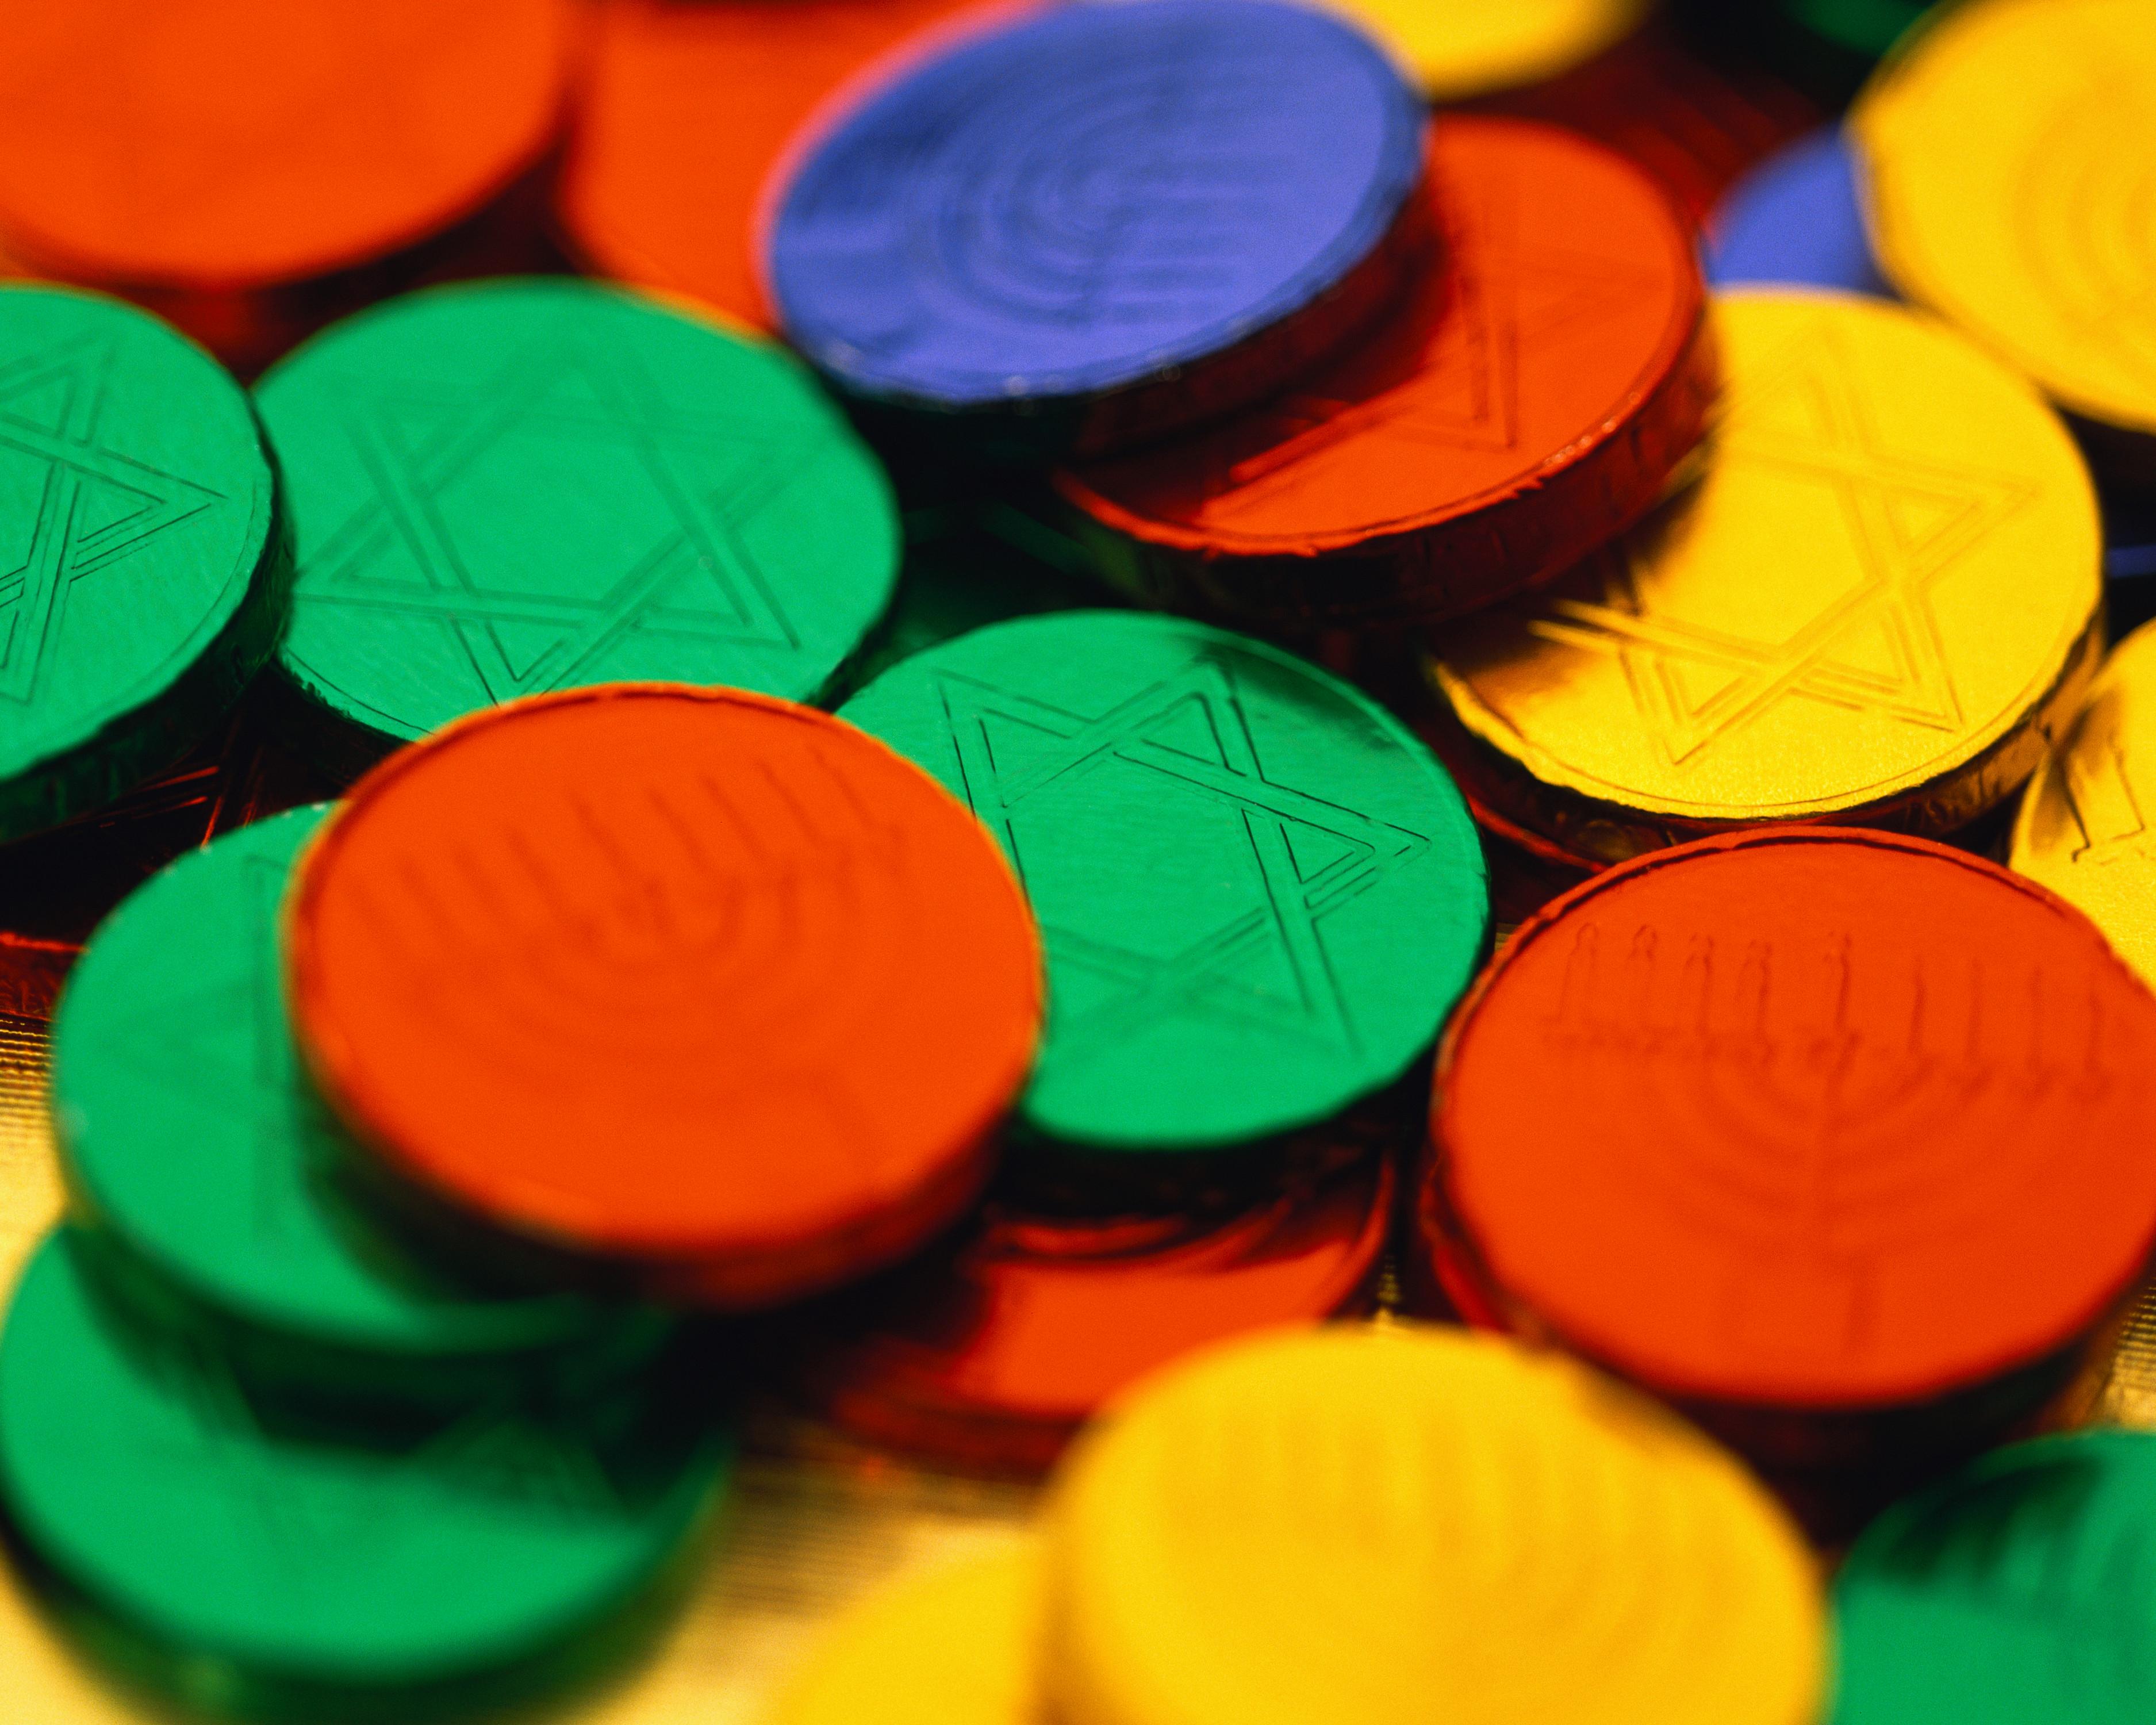 colorful-hanukkah-chocolate-coins - Hanukkah Pictures - Hanukkah ...